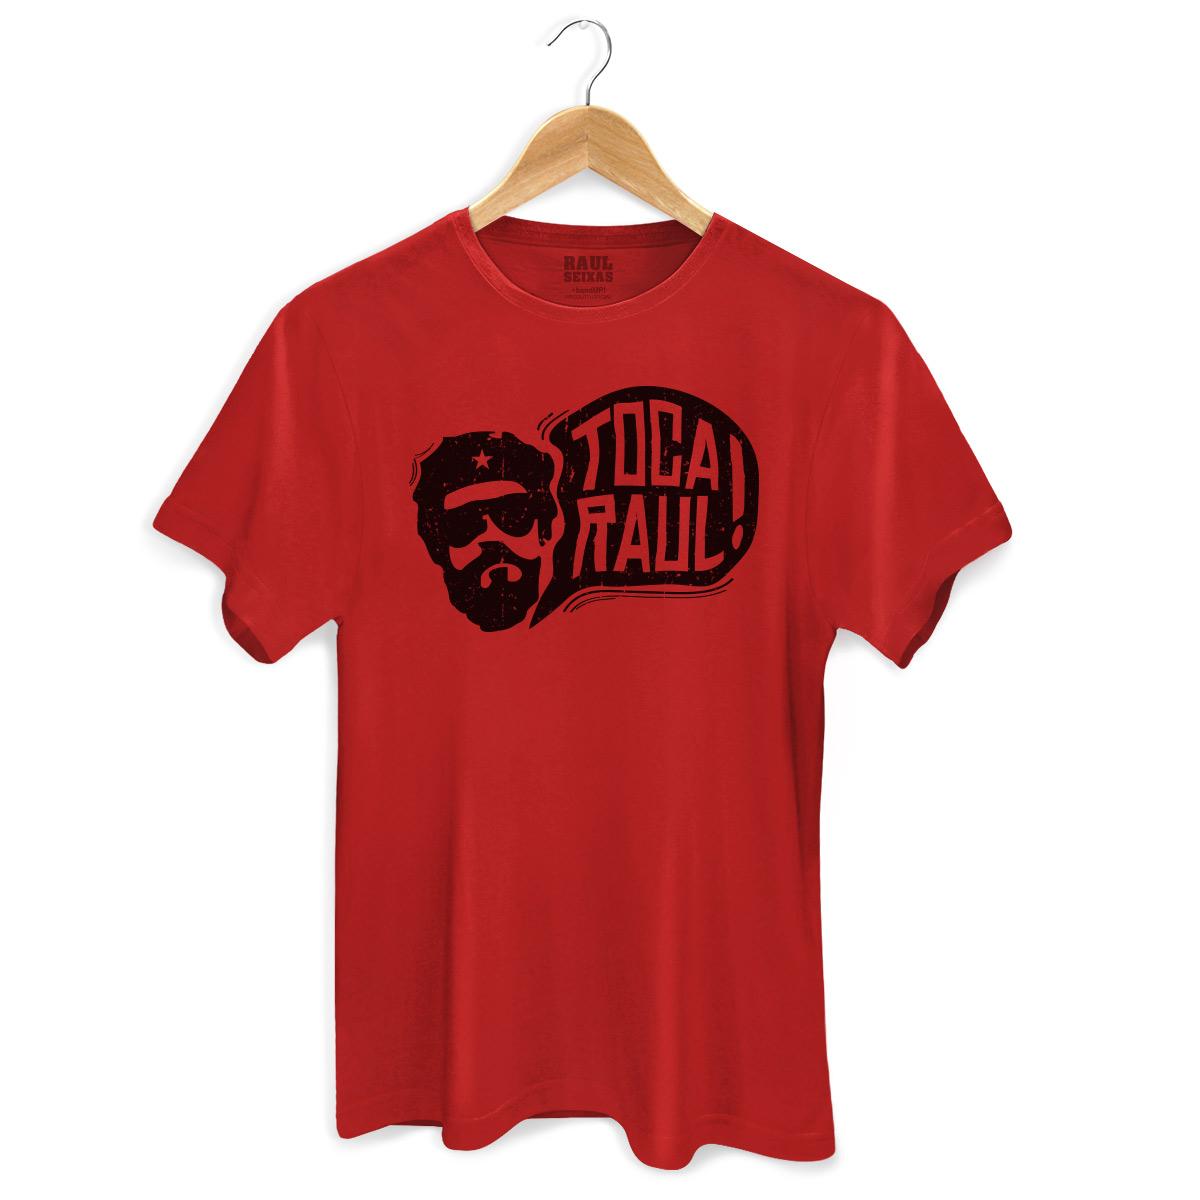 Camiseta Masculina Raul Seixas Toca Raul! 2  - bandUP Store Marketplace